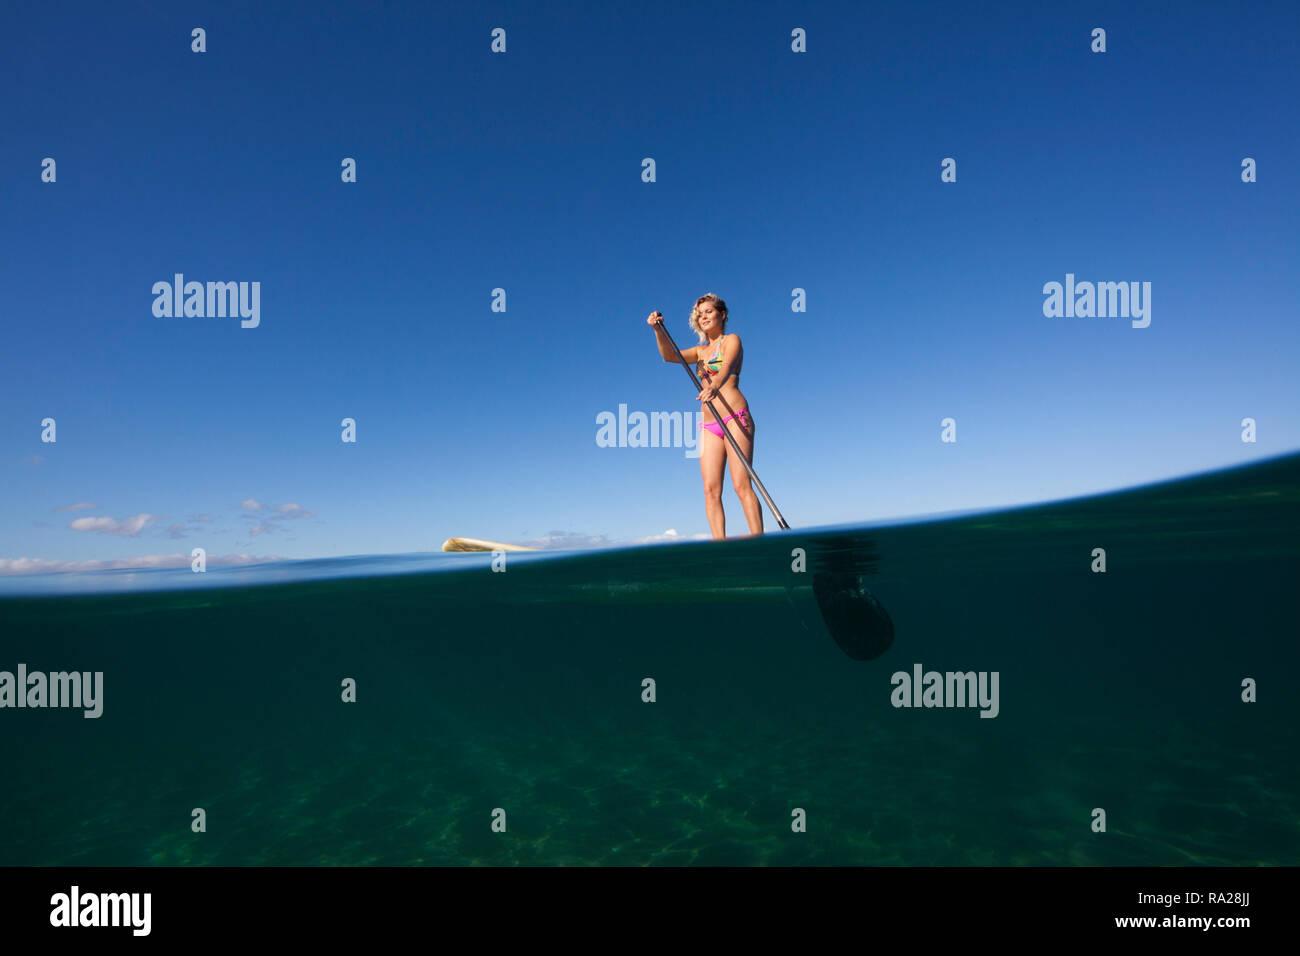 Split level view of a woman stand up paddling at Palauea, Maui, Hawaii. - Stock Image